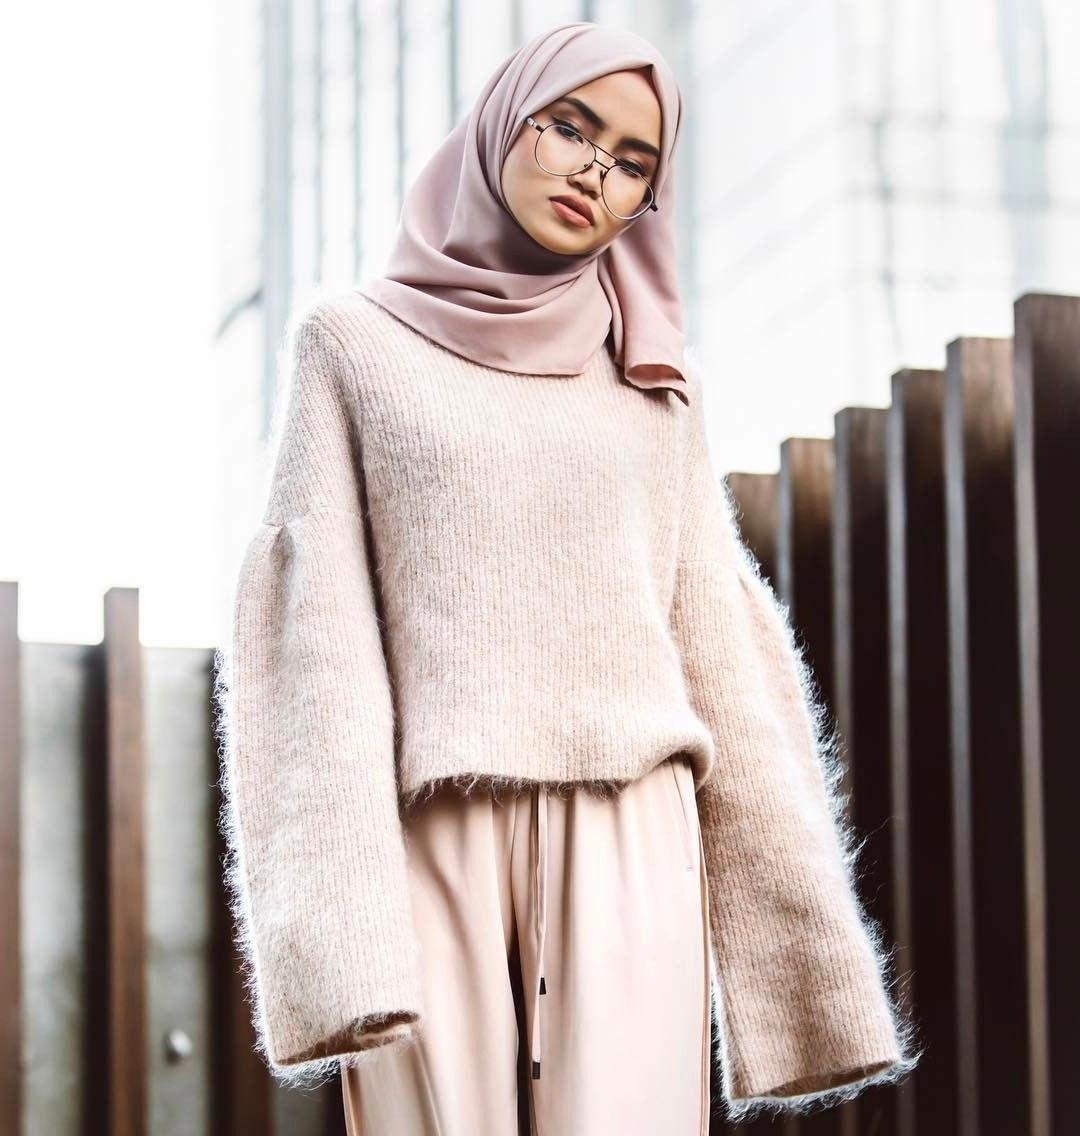 Bentuk Fashion Muslim Korea Thdr Beautiful Bination